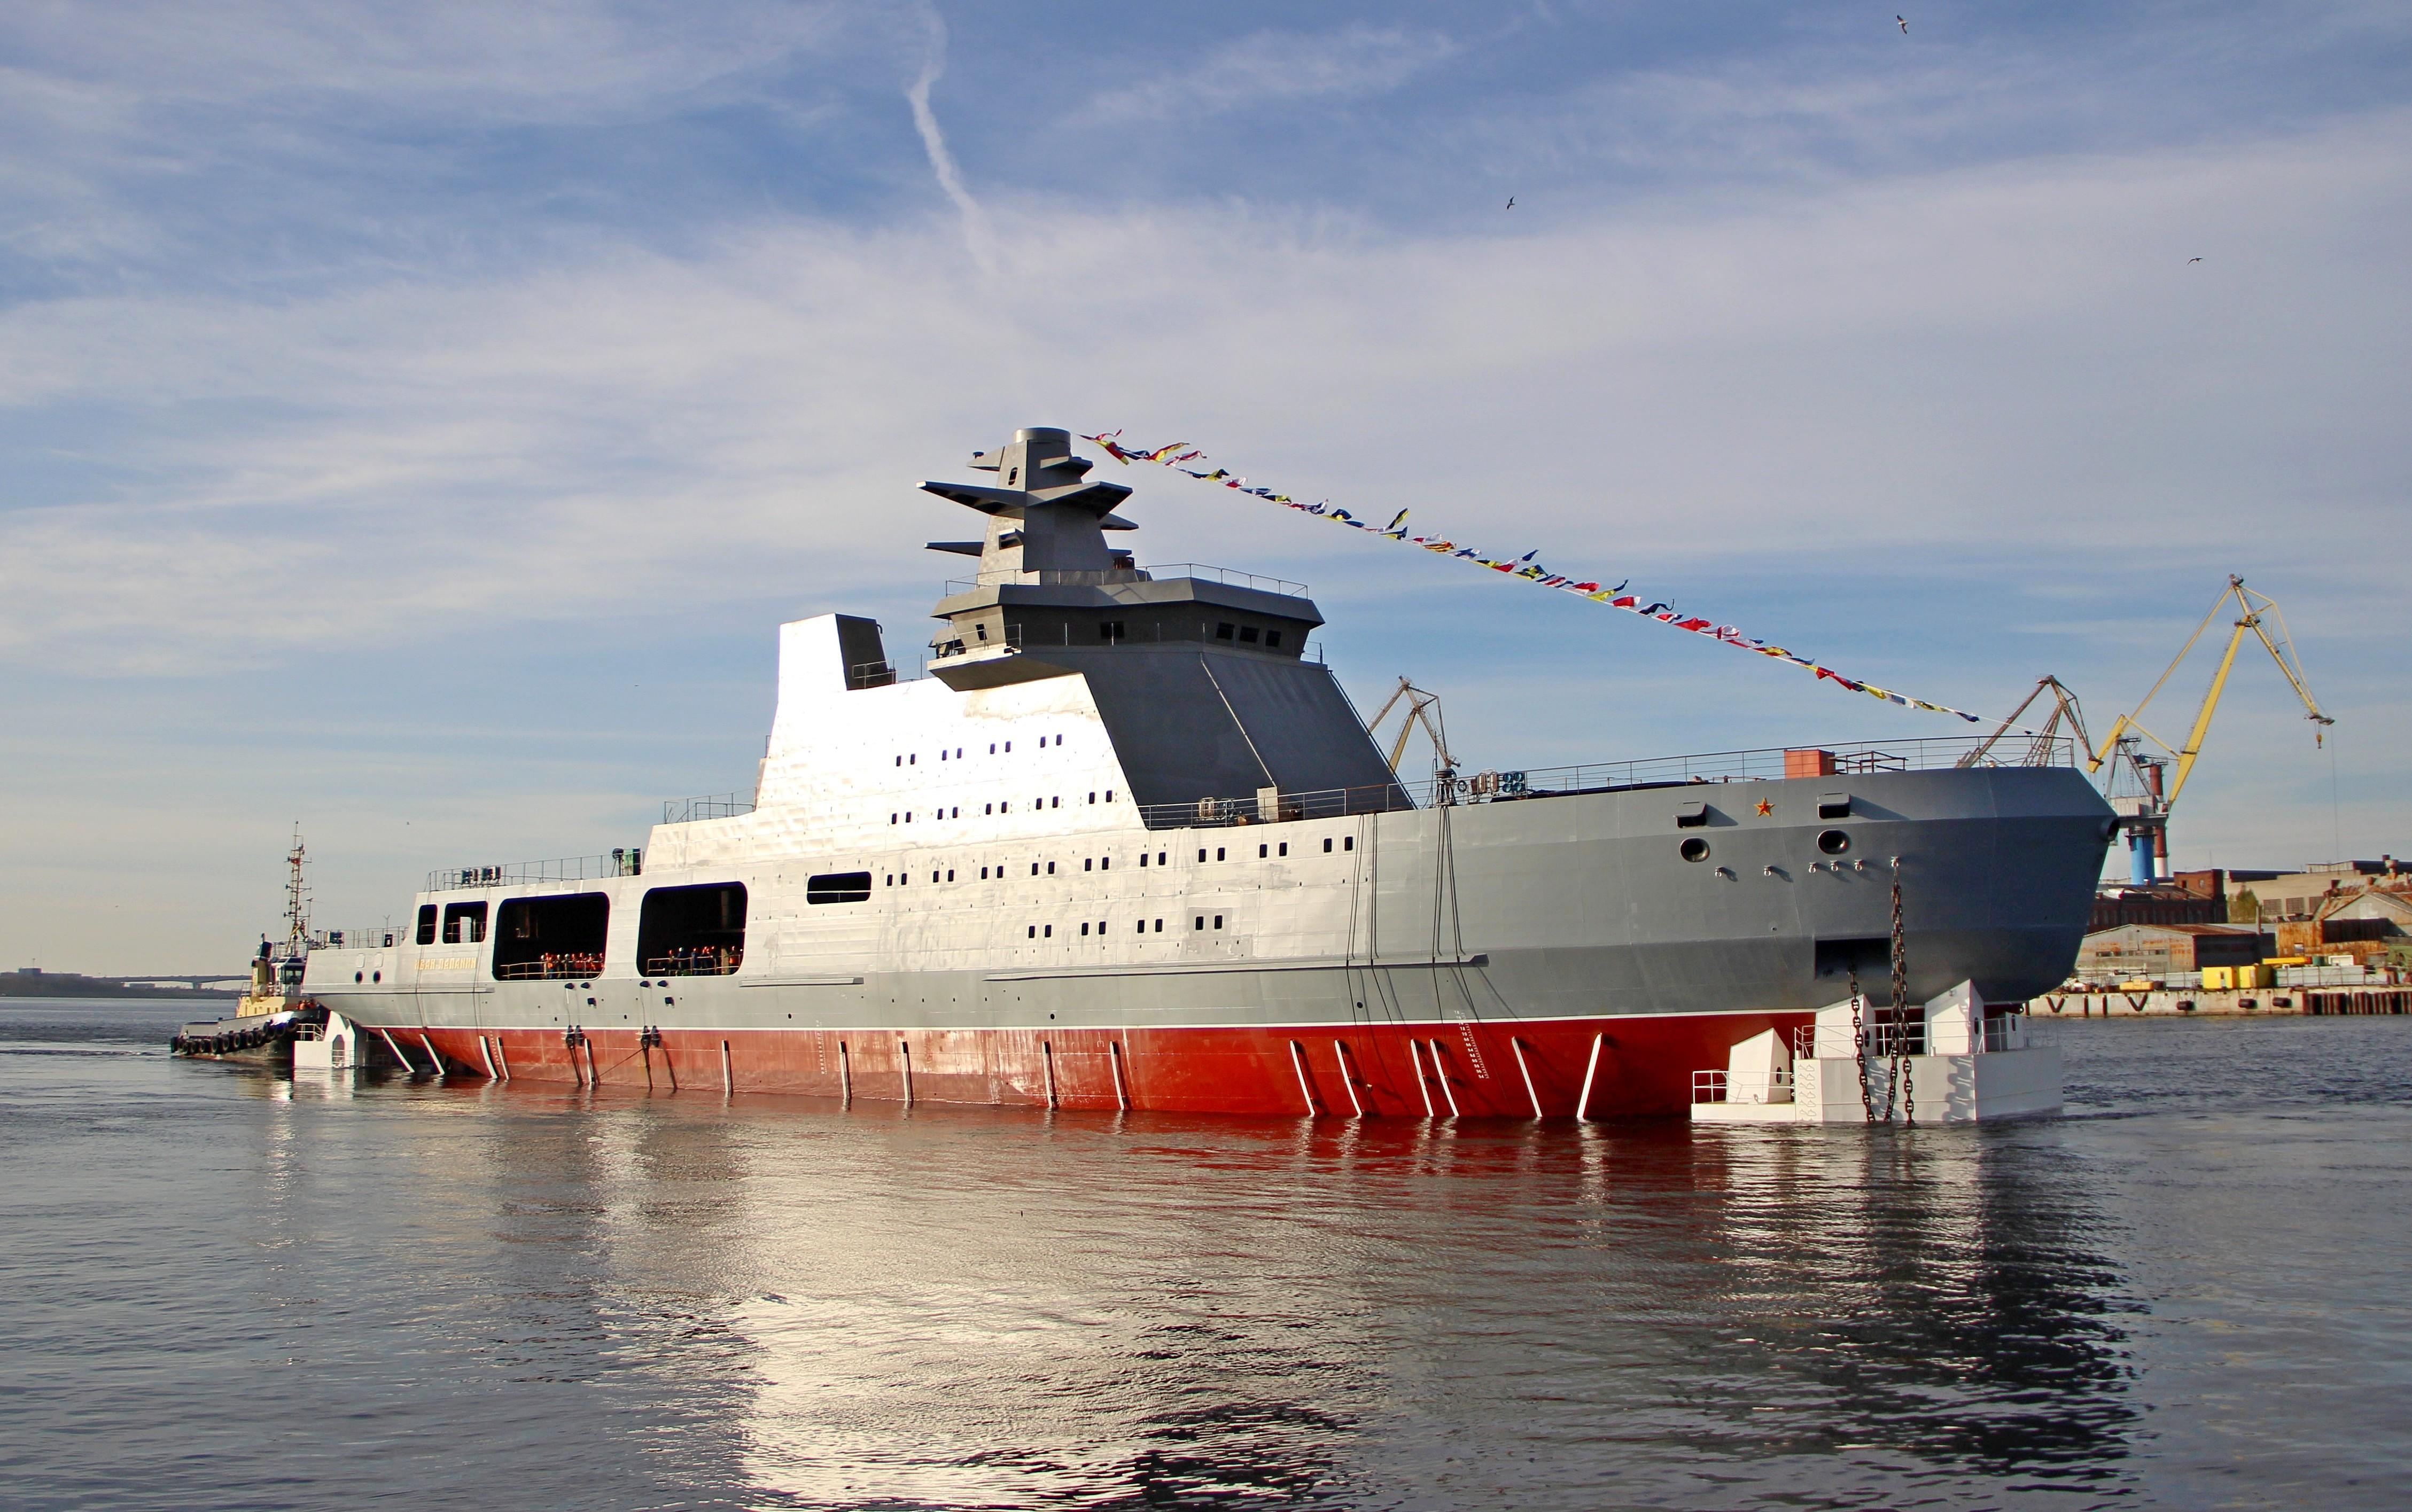 Project 23550 Arctic patrol ship 25-7986477-23550-ivan-papanin-spusk-admiraltejskie-verfi-25.10.2019